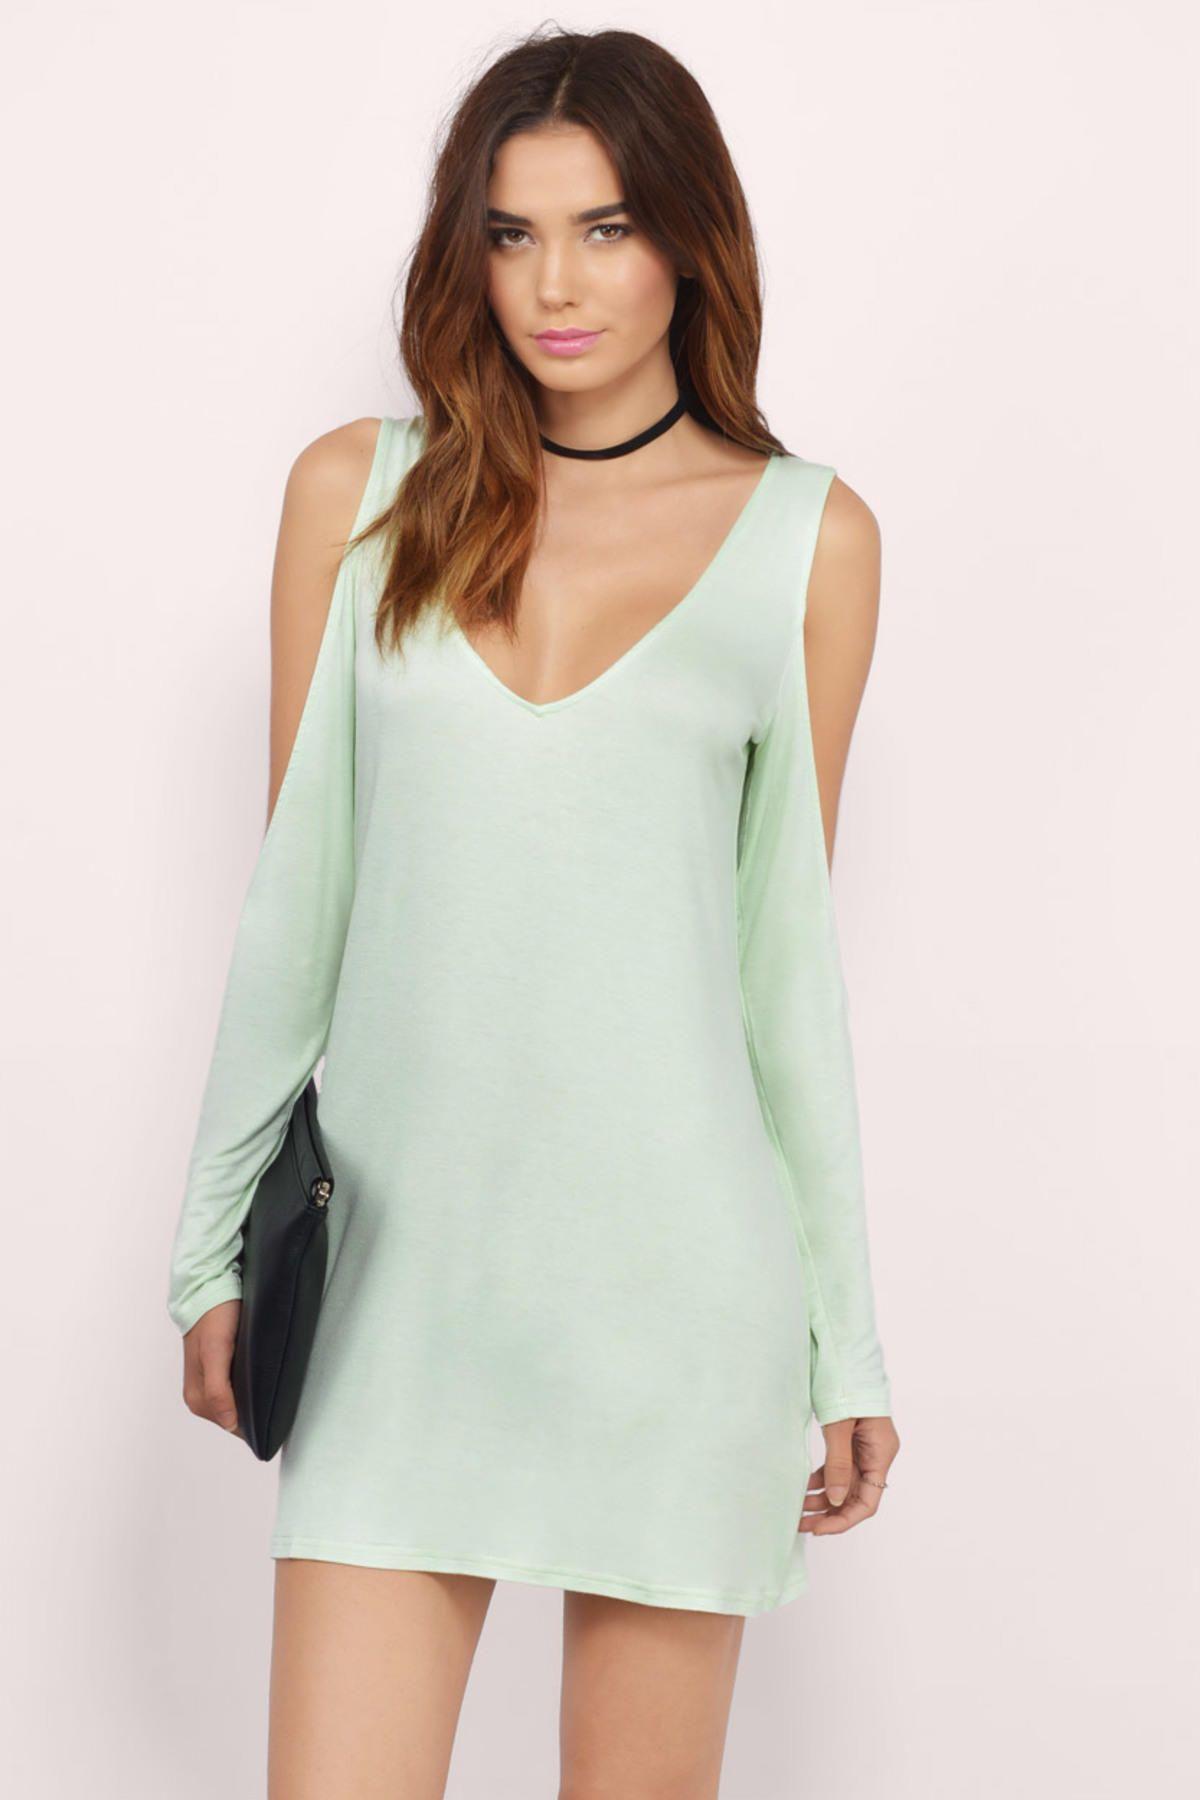 Green dress night out  Mint Missy Dress at   Threads  Pinterest